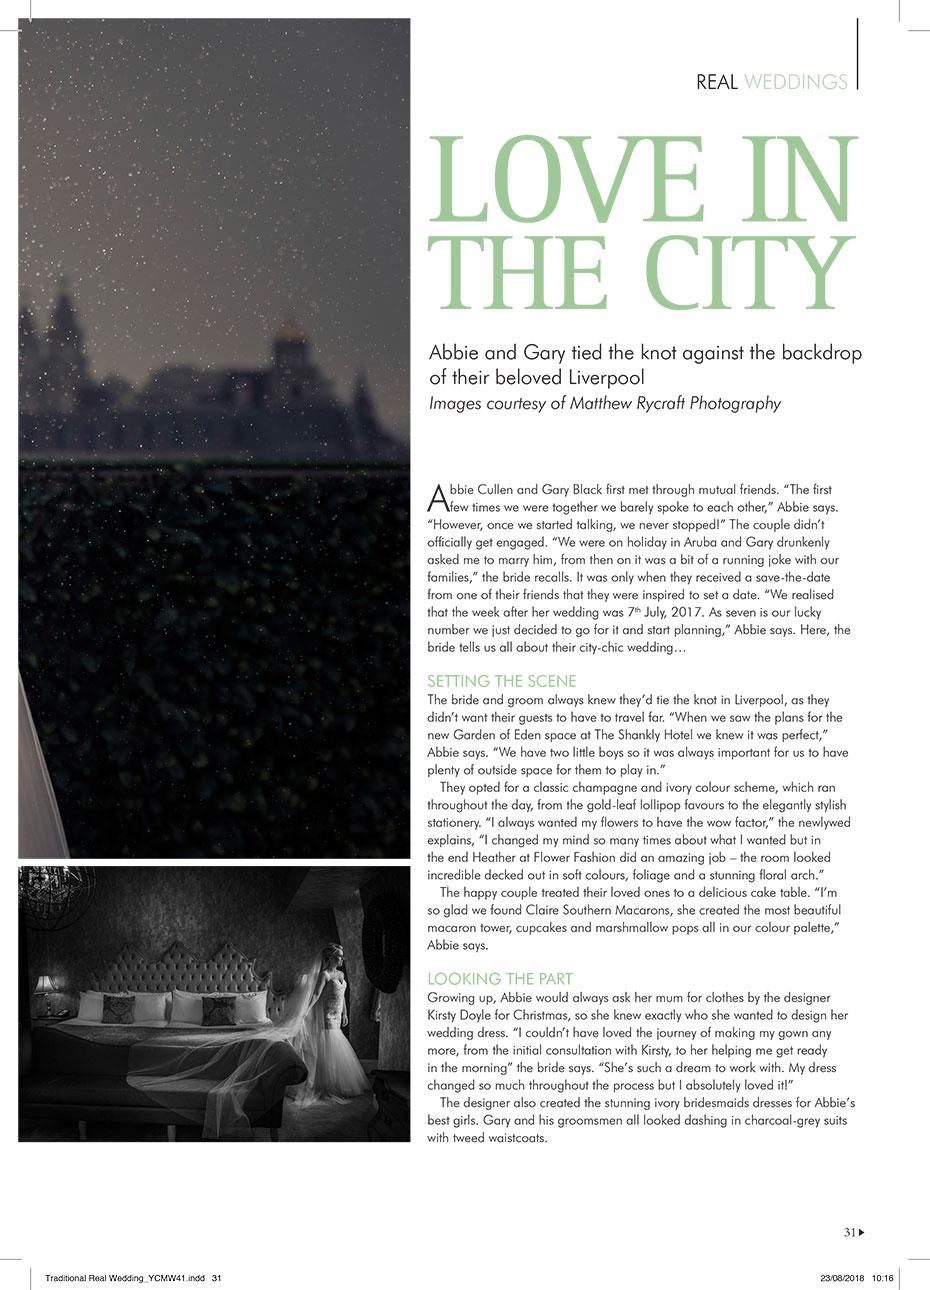 Your Cheshire and Merseyside Wedding Magazine